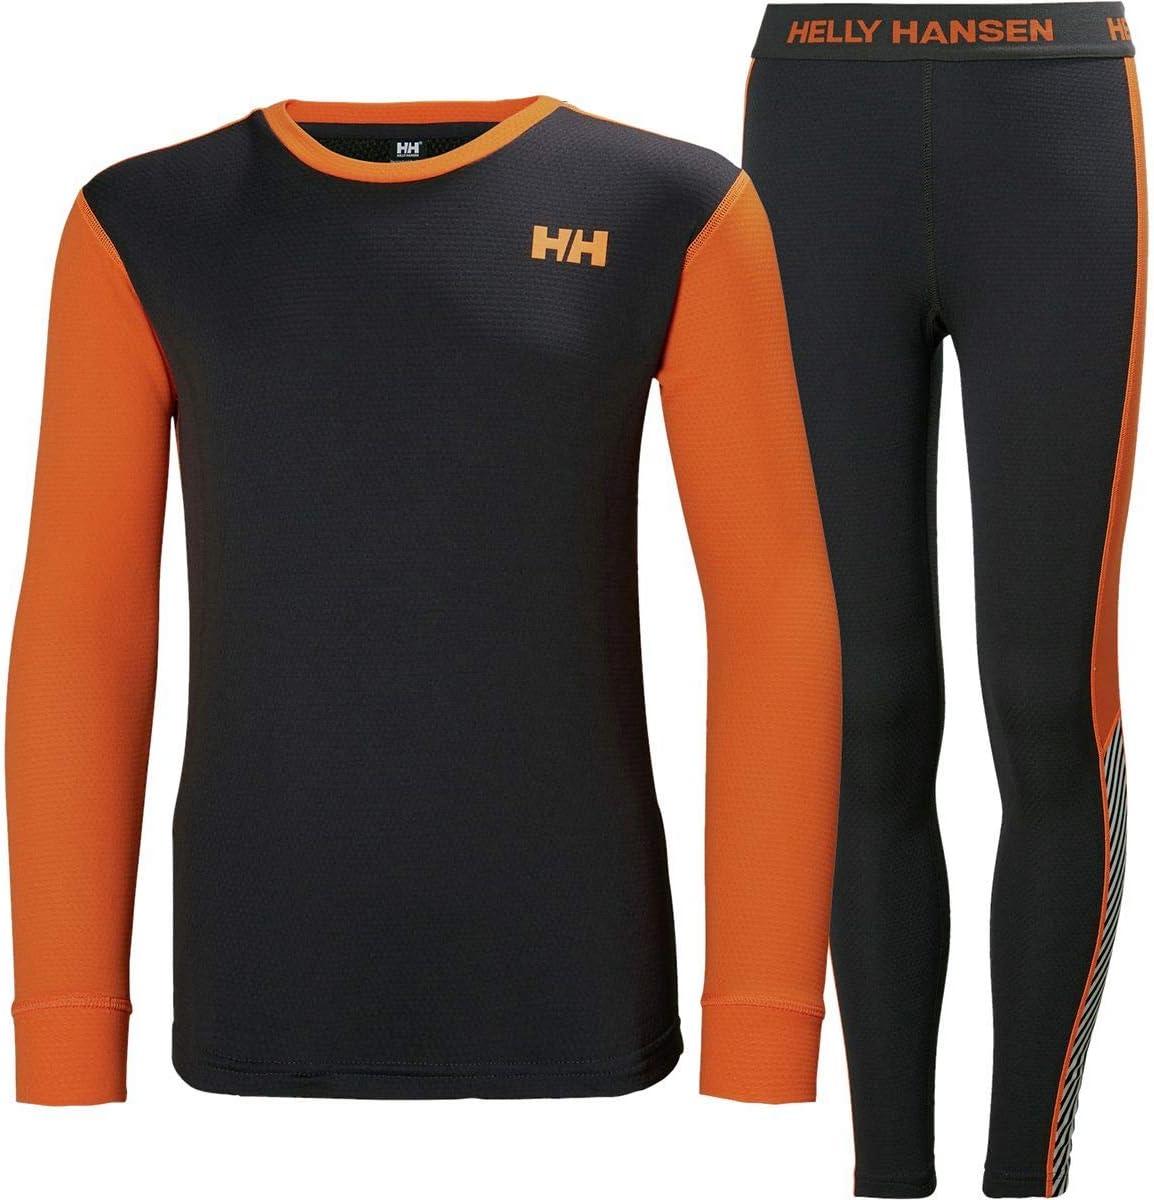 Helly Hansen Hh LIFA Active Set Baselayer Lightweight 2-Layer Crewneck Thermal Baselayer Set